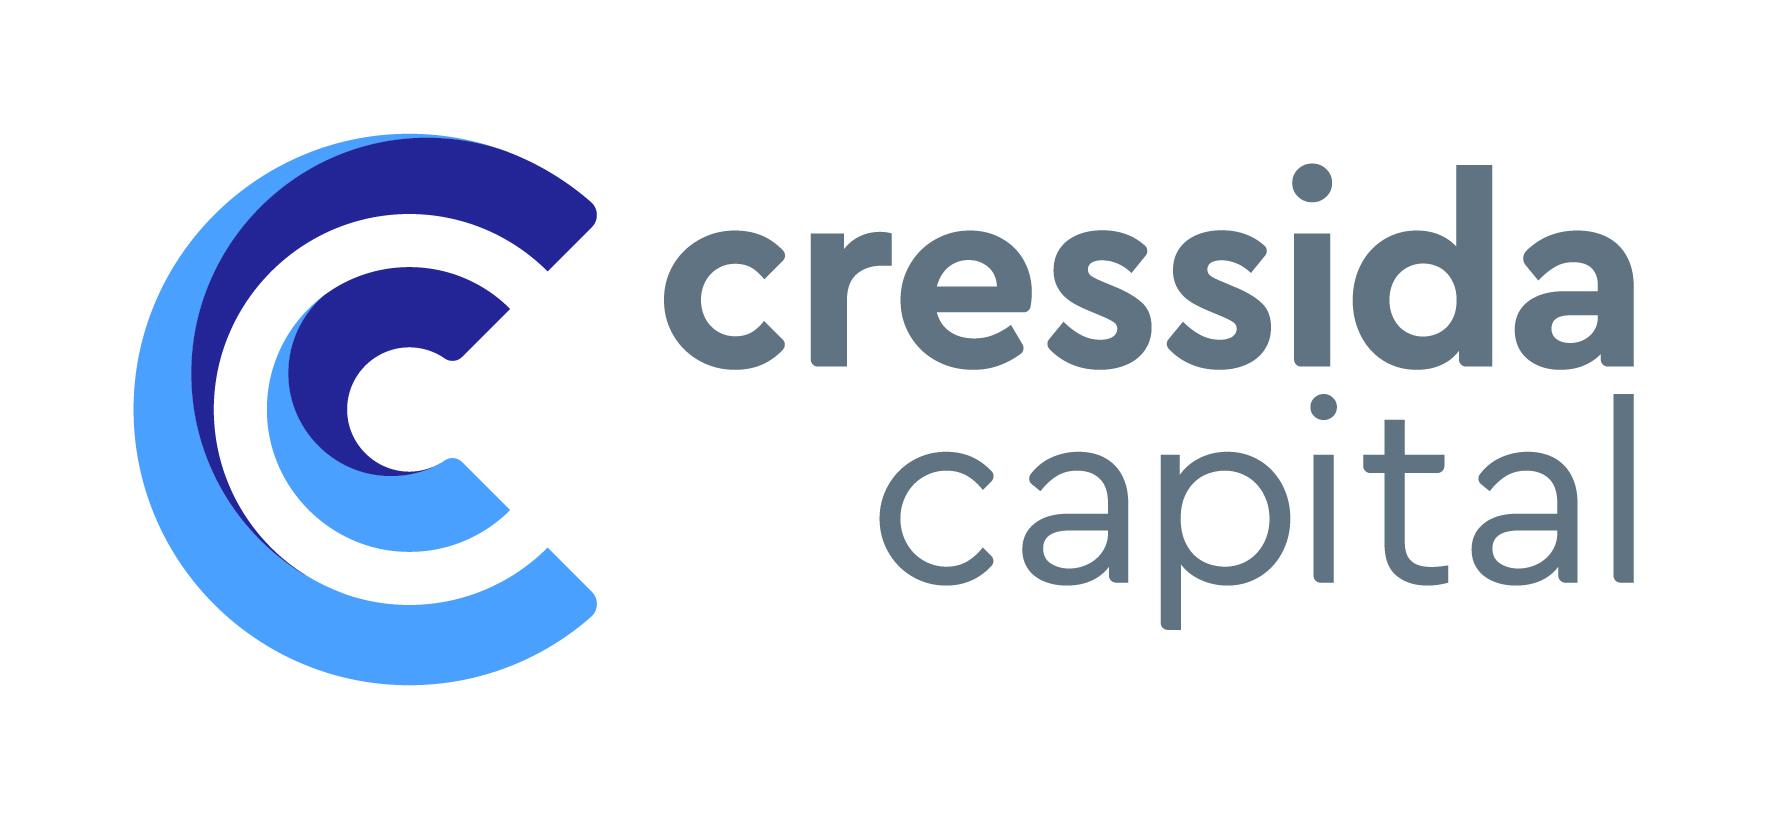 Cressida Capital